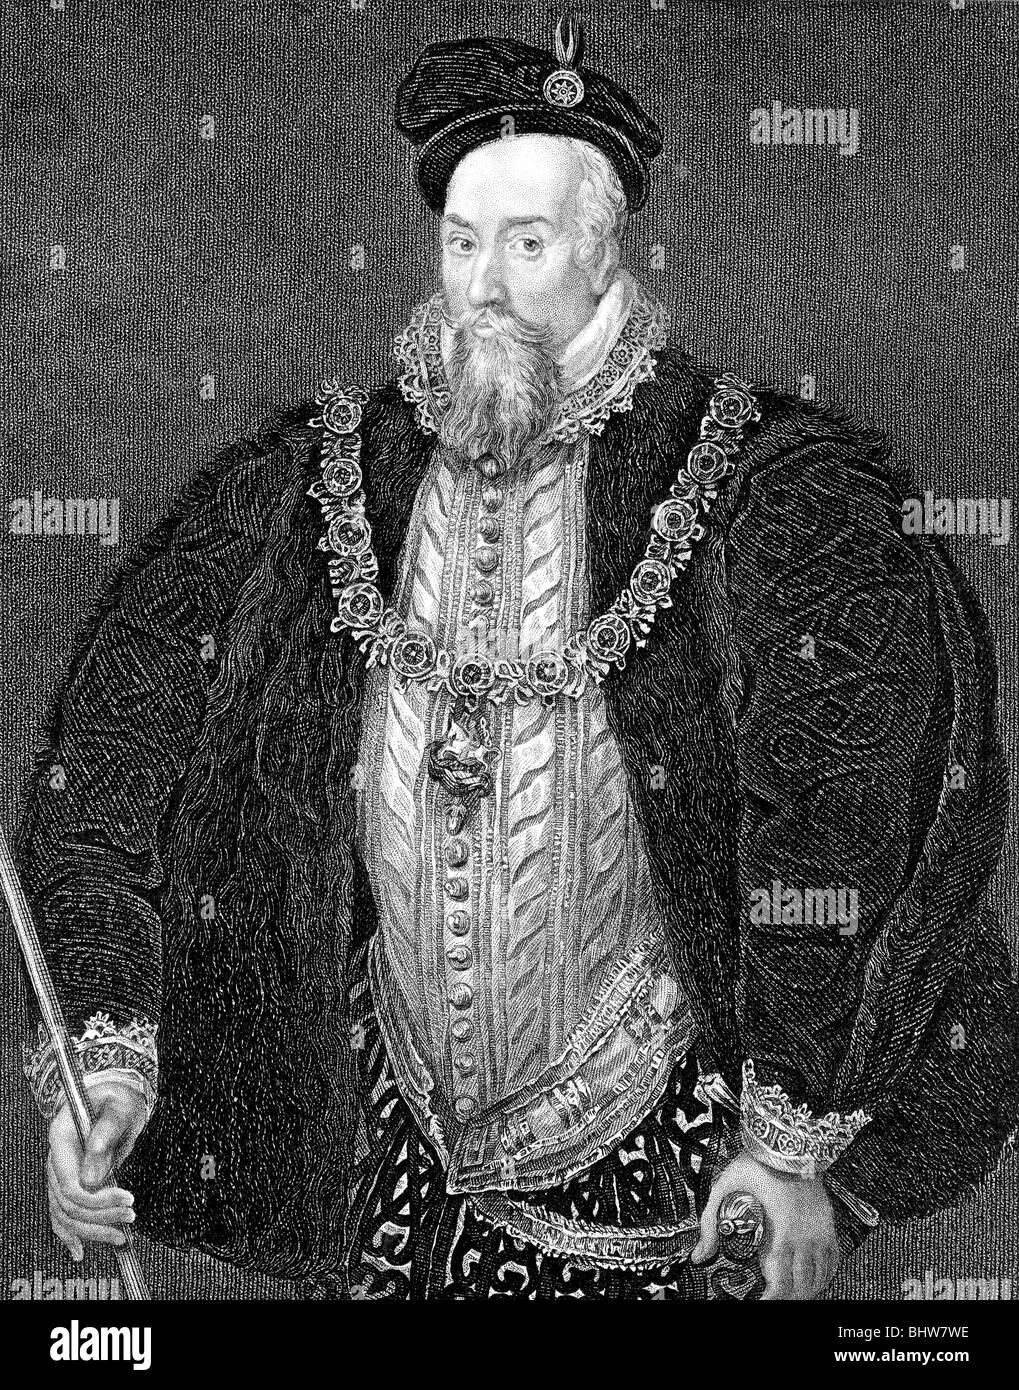 SIR ROBERT CECIL, Ist Earl of Salisbury  - Elizabethan statesman (1563-1612) - Stock Image